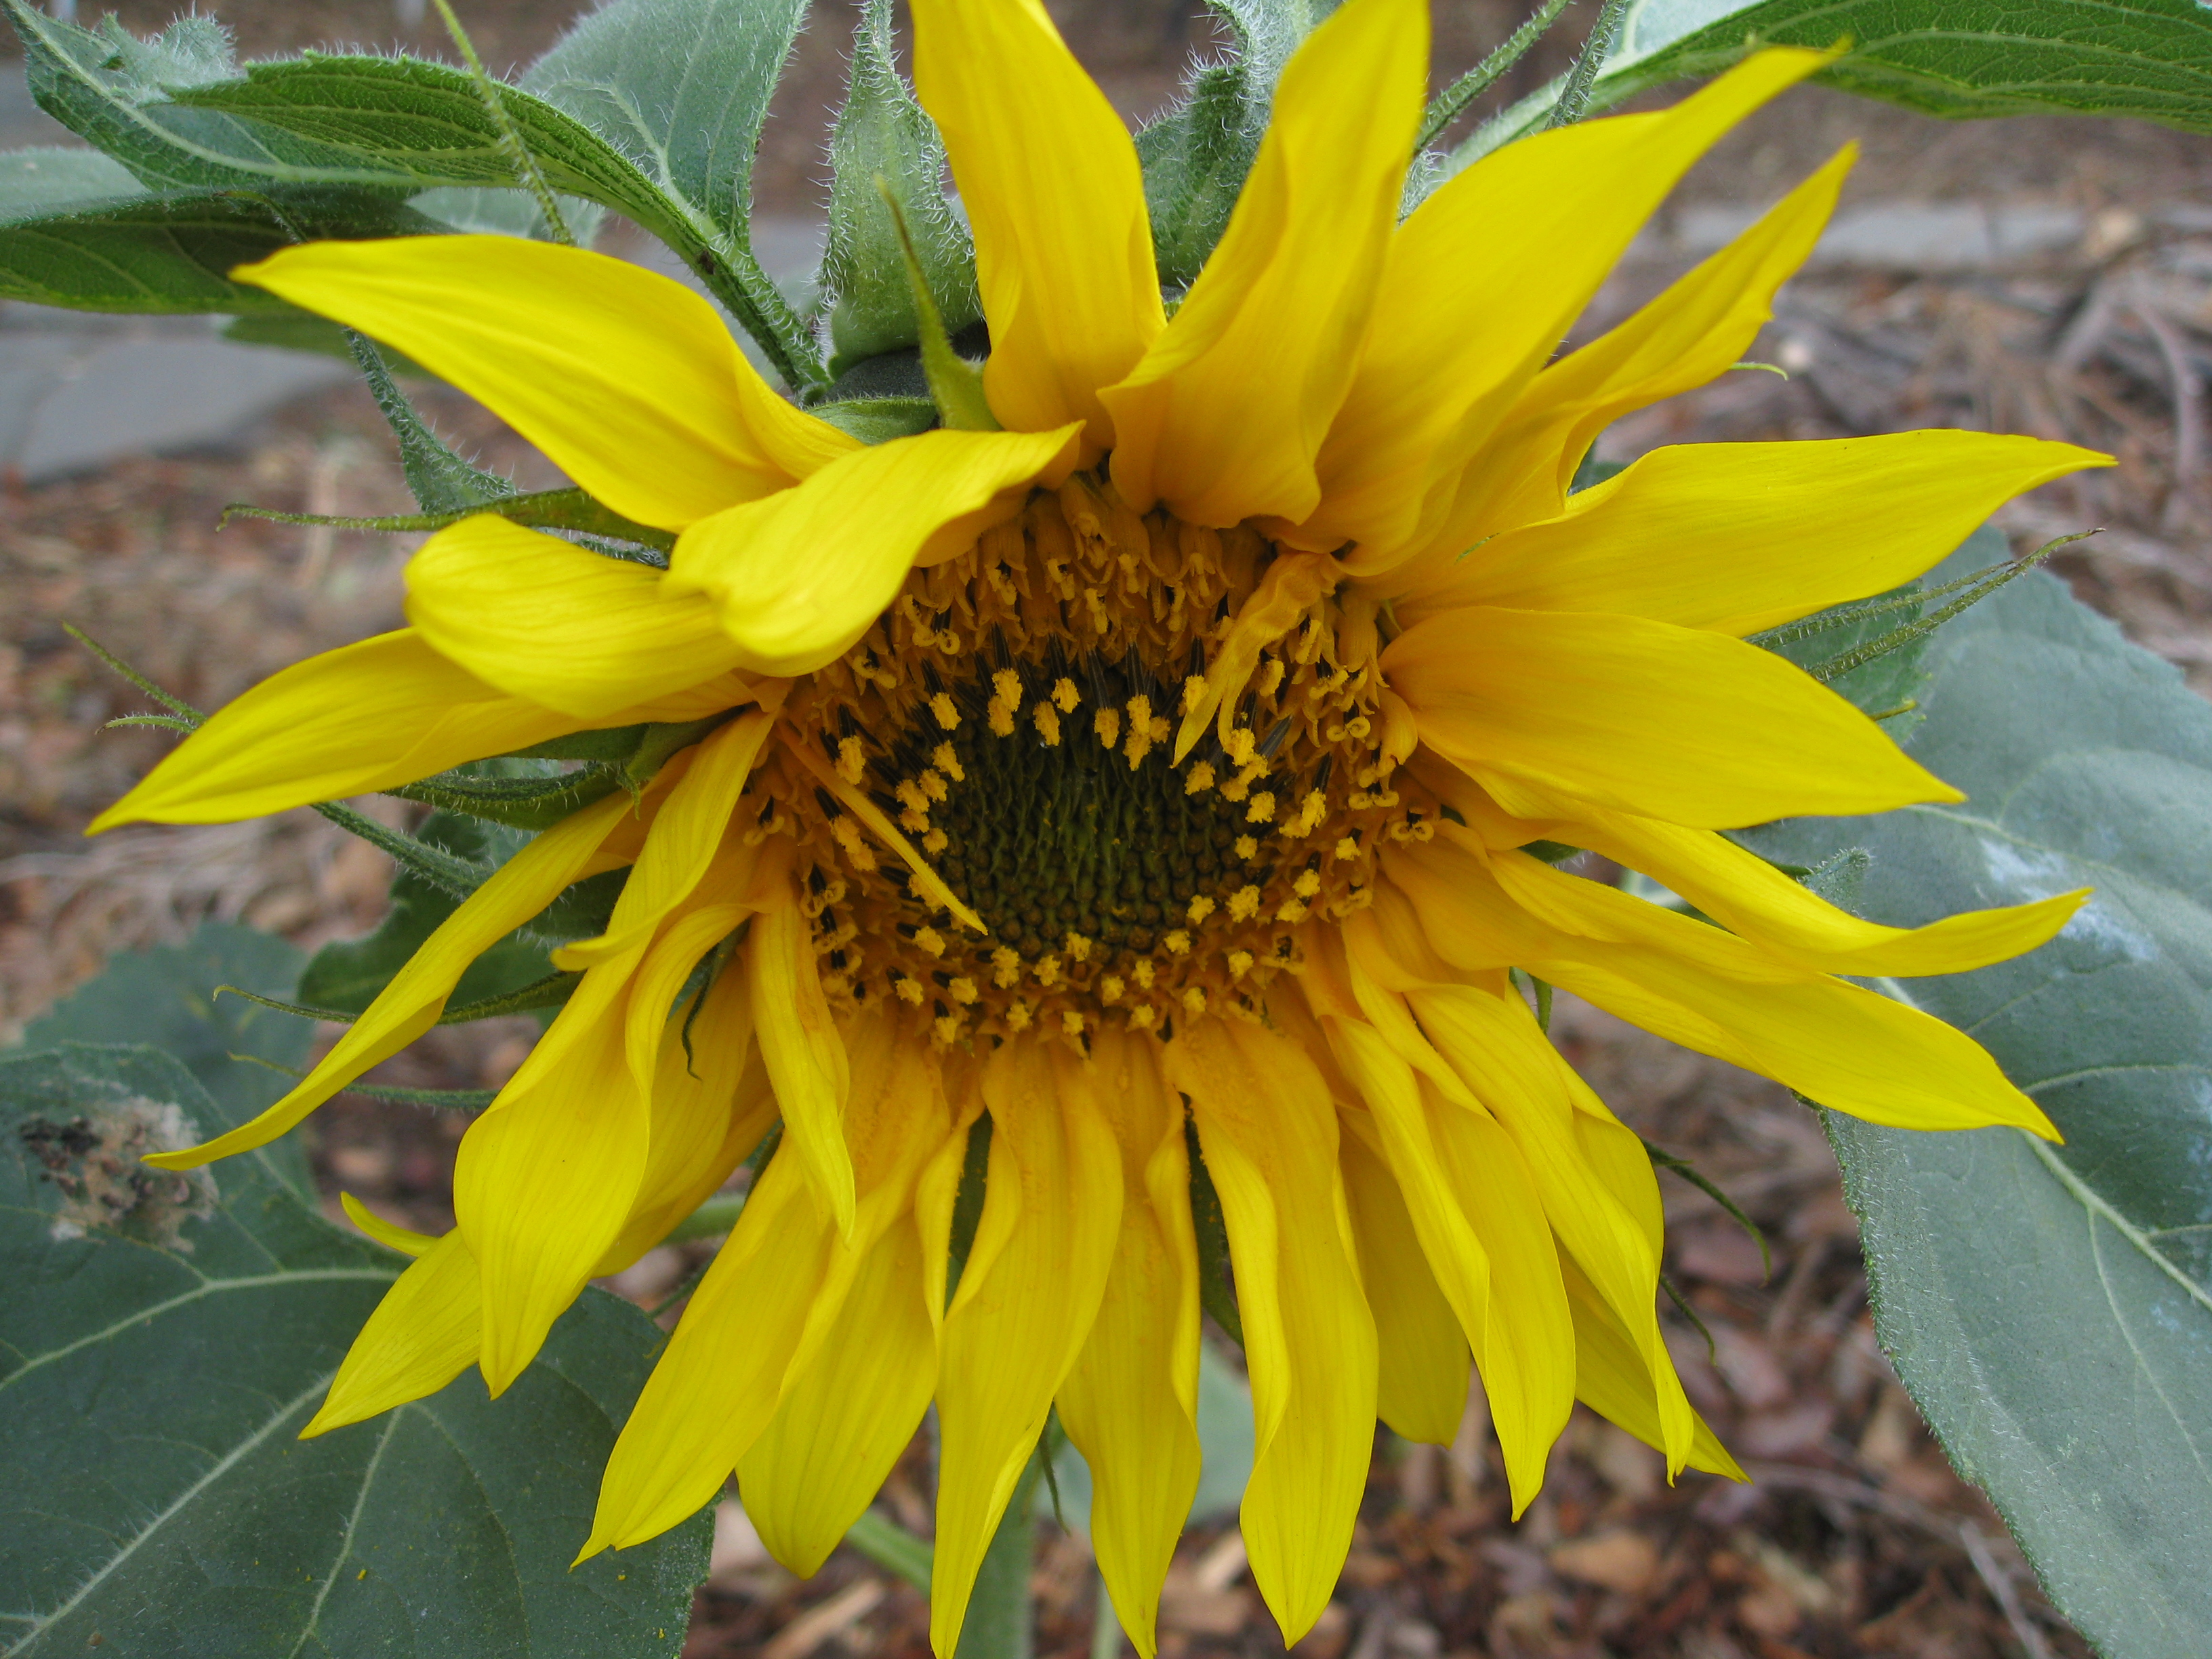 Volunteer sunflower graces the garden with her presence.